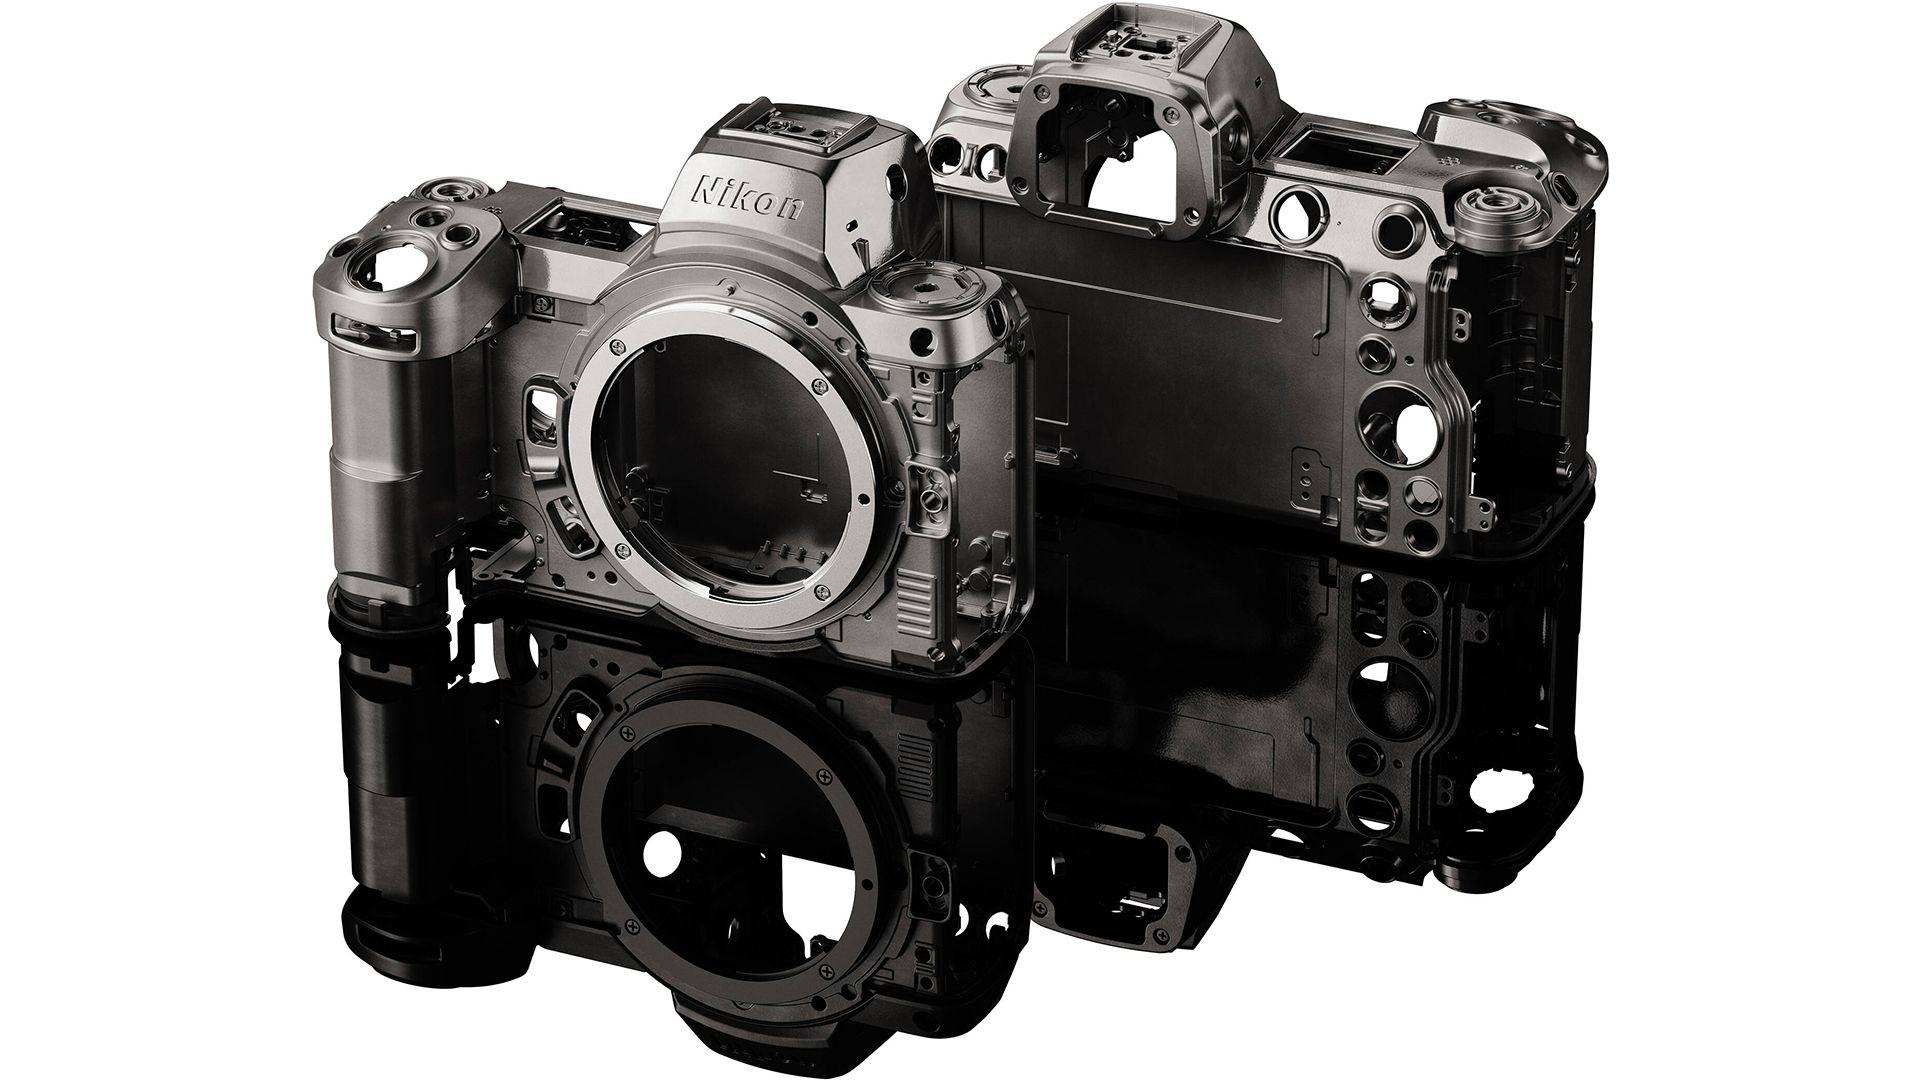 Корпуса Nikon Z6 II и Z7 II